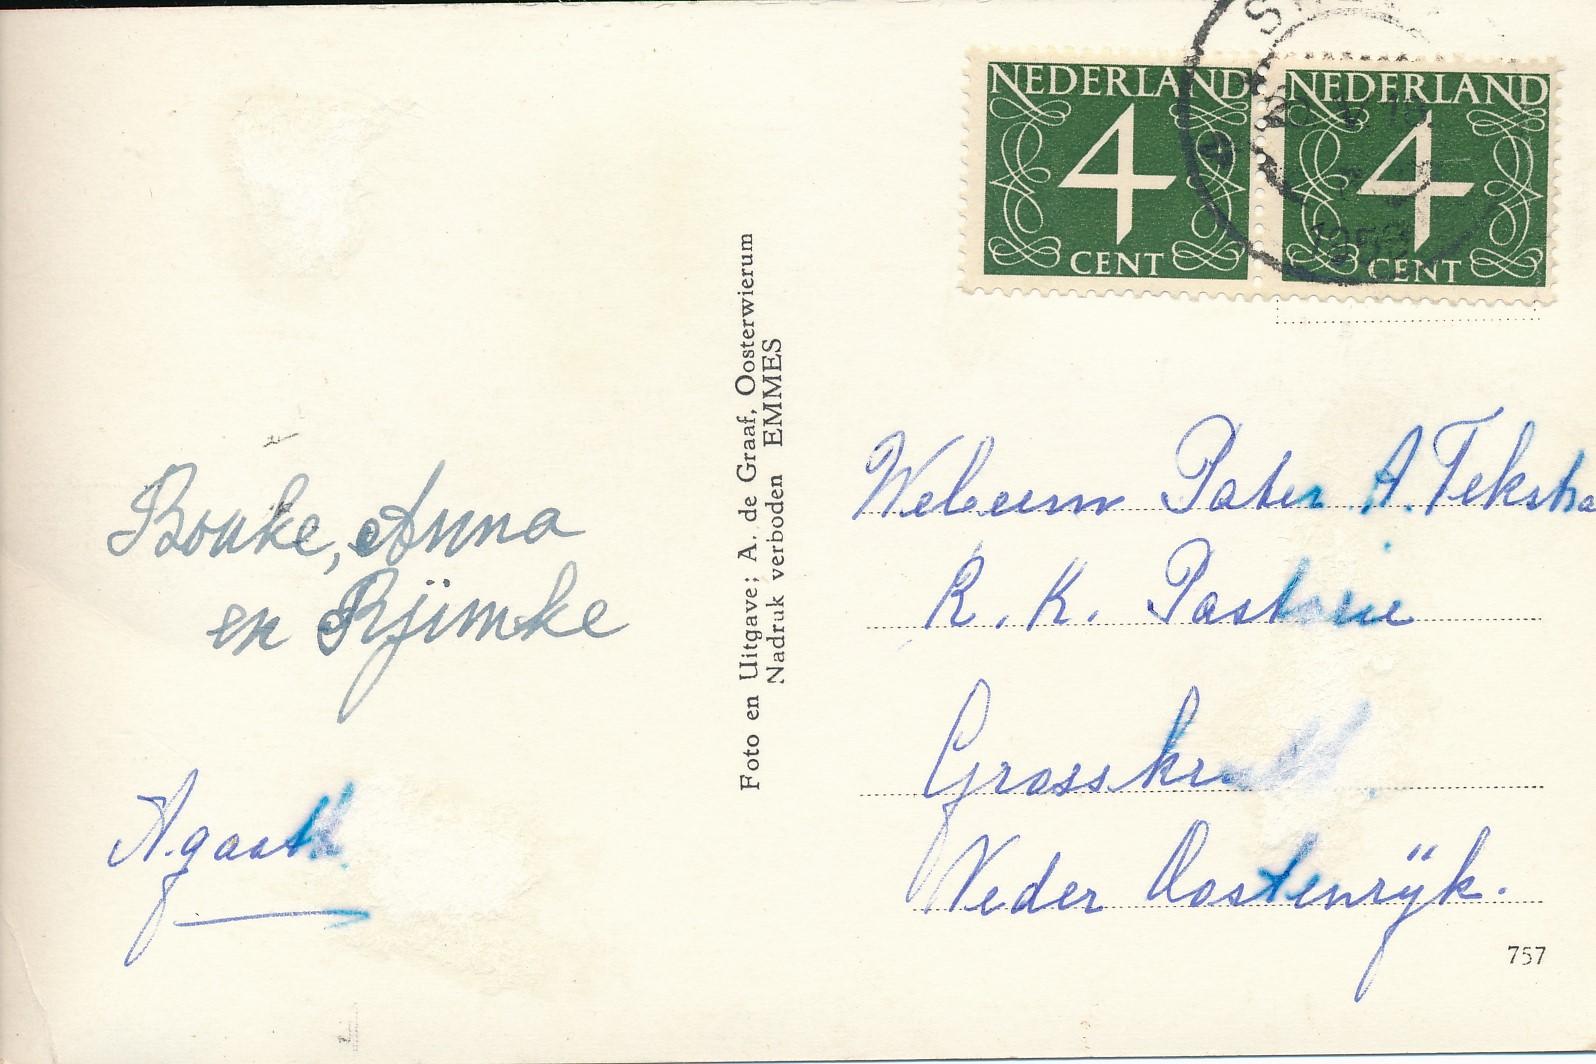 Fotoalbum Andre Kamsma, 205, ansichtkaart, 1953